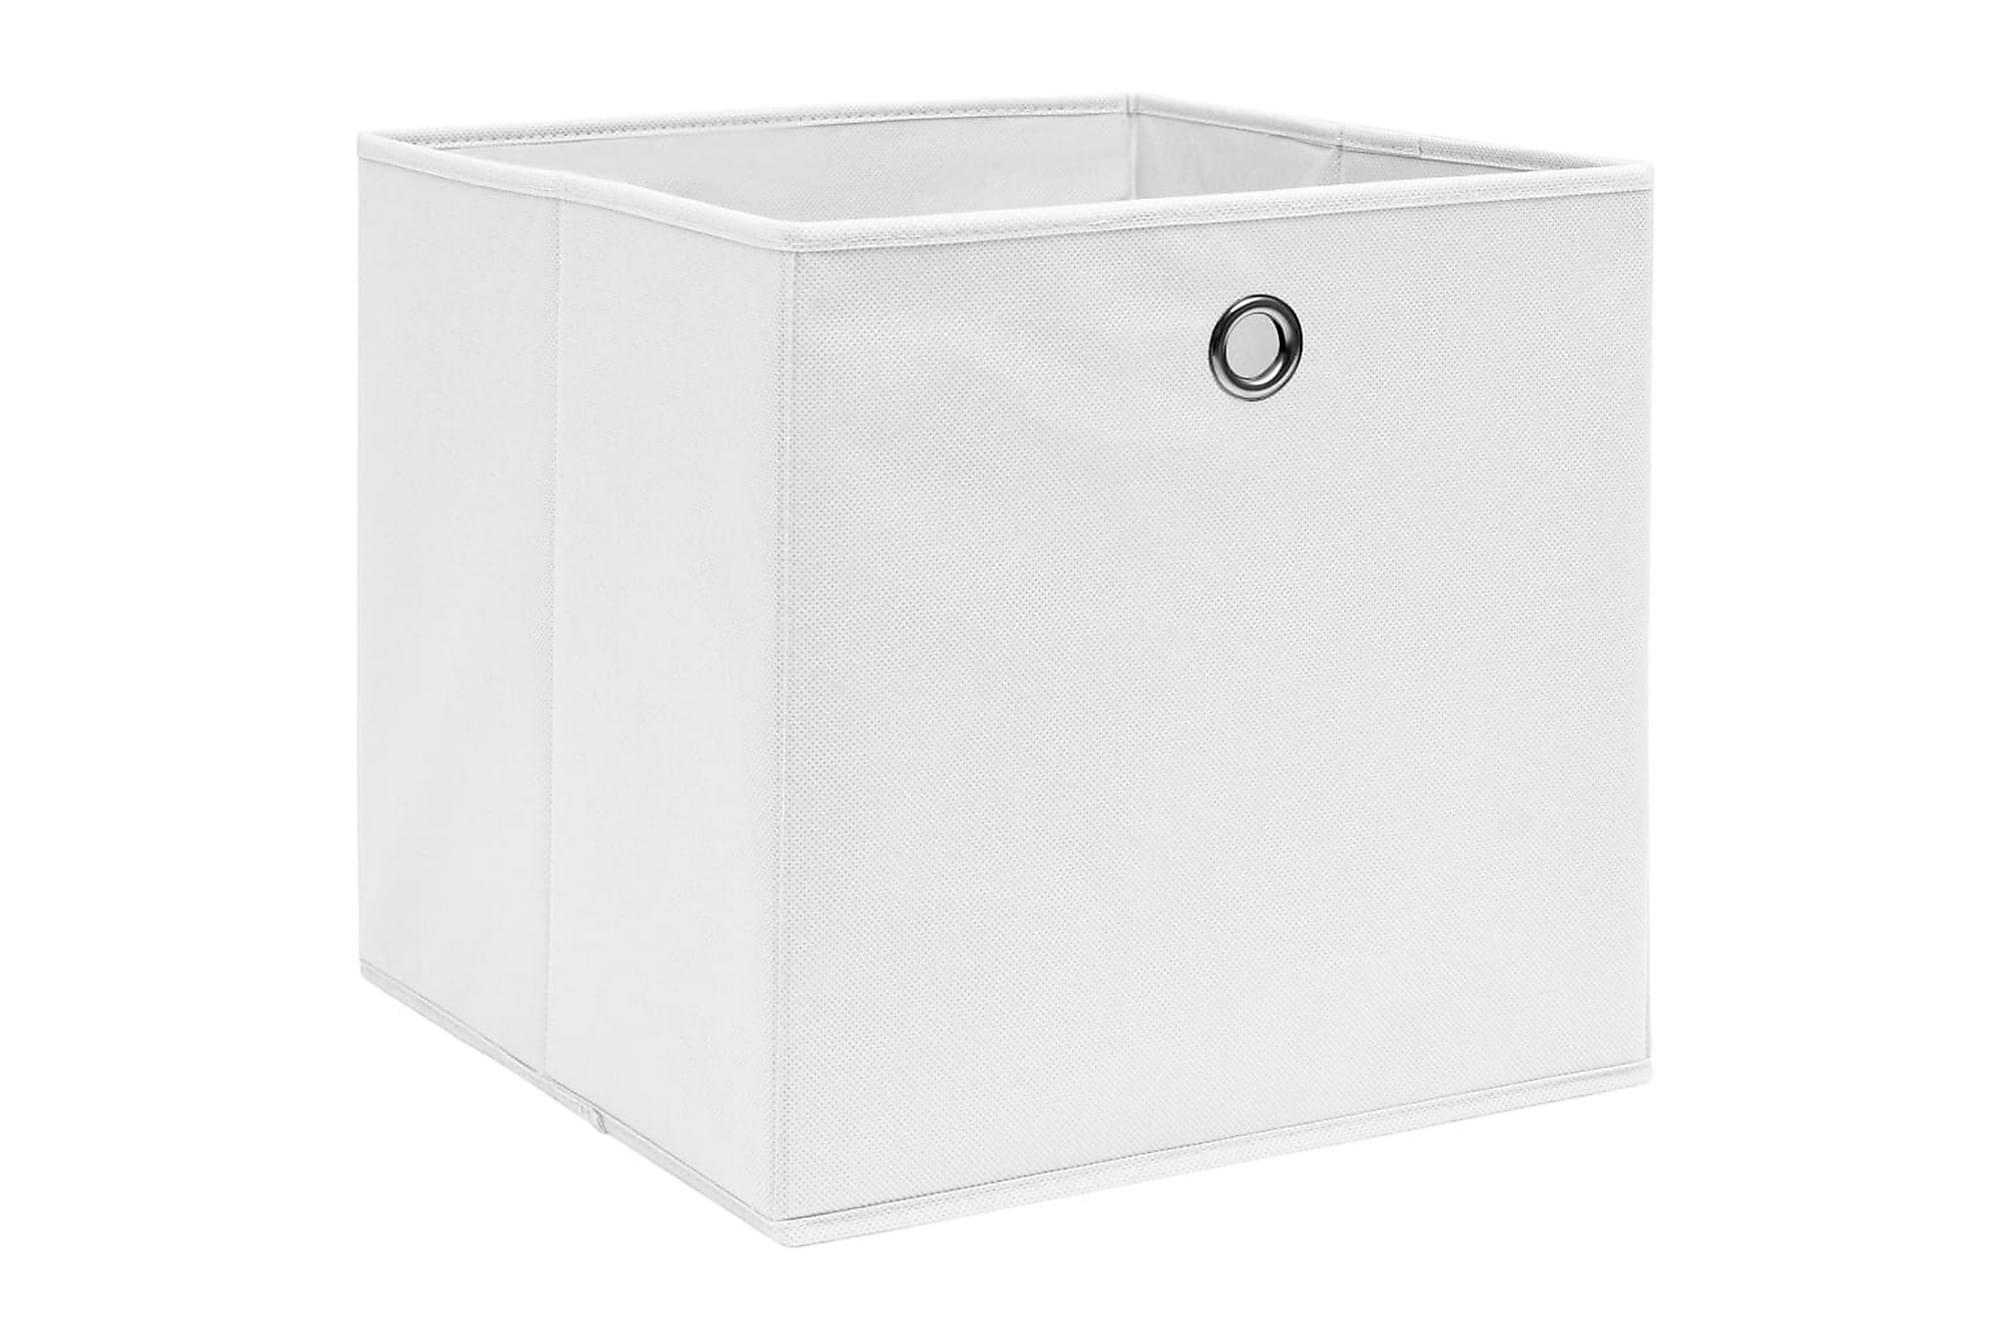 Förvaringslådor 10 st vit 32x32x32 cm tyg, Förvaringslådor & korgar